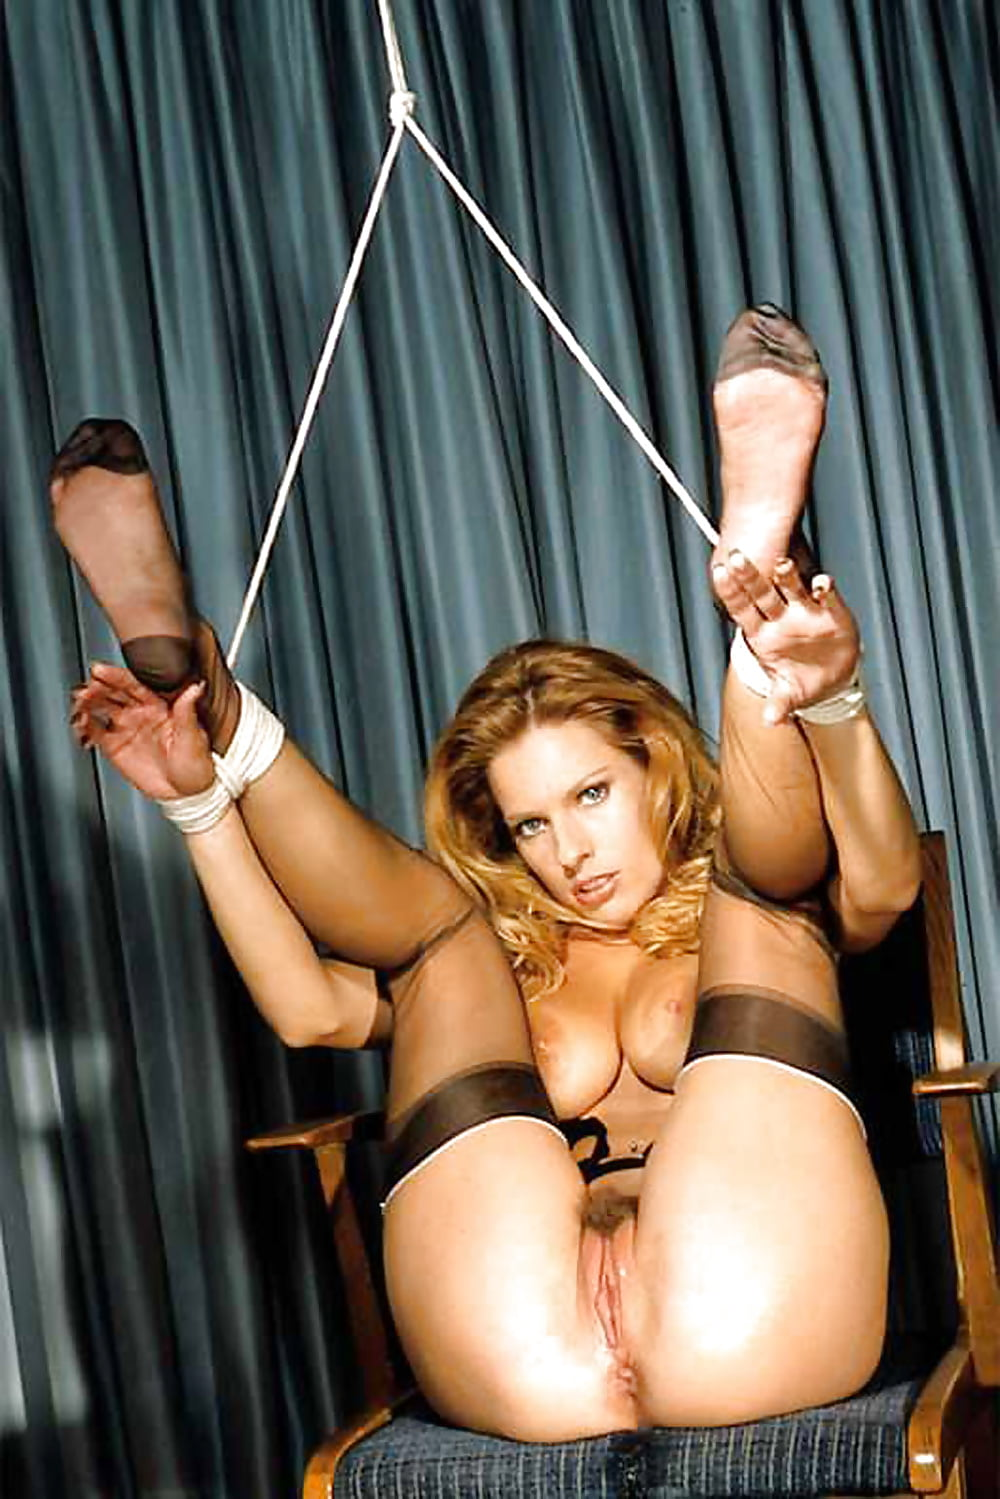 free-jessica-simpson-fake-porn-pics